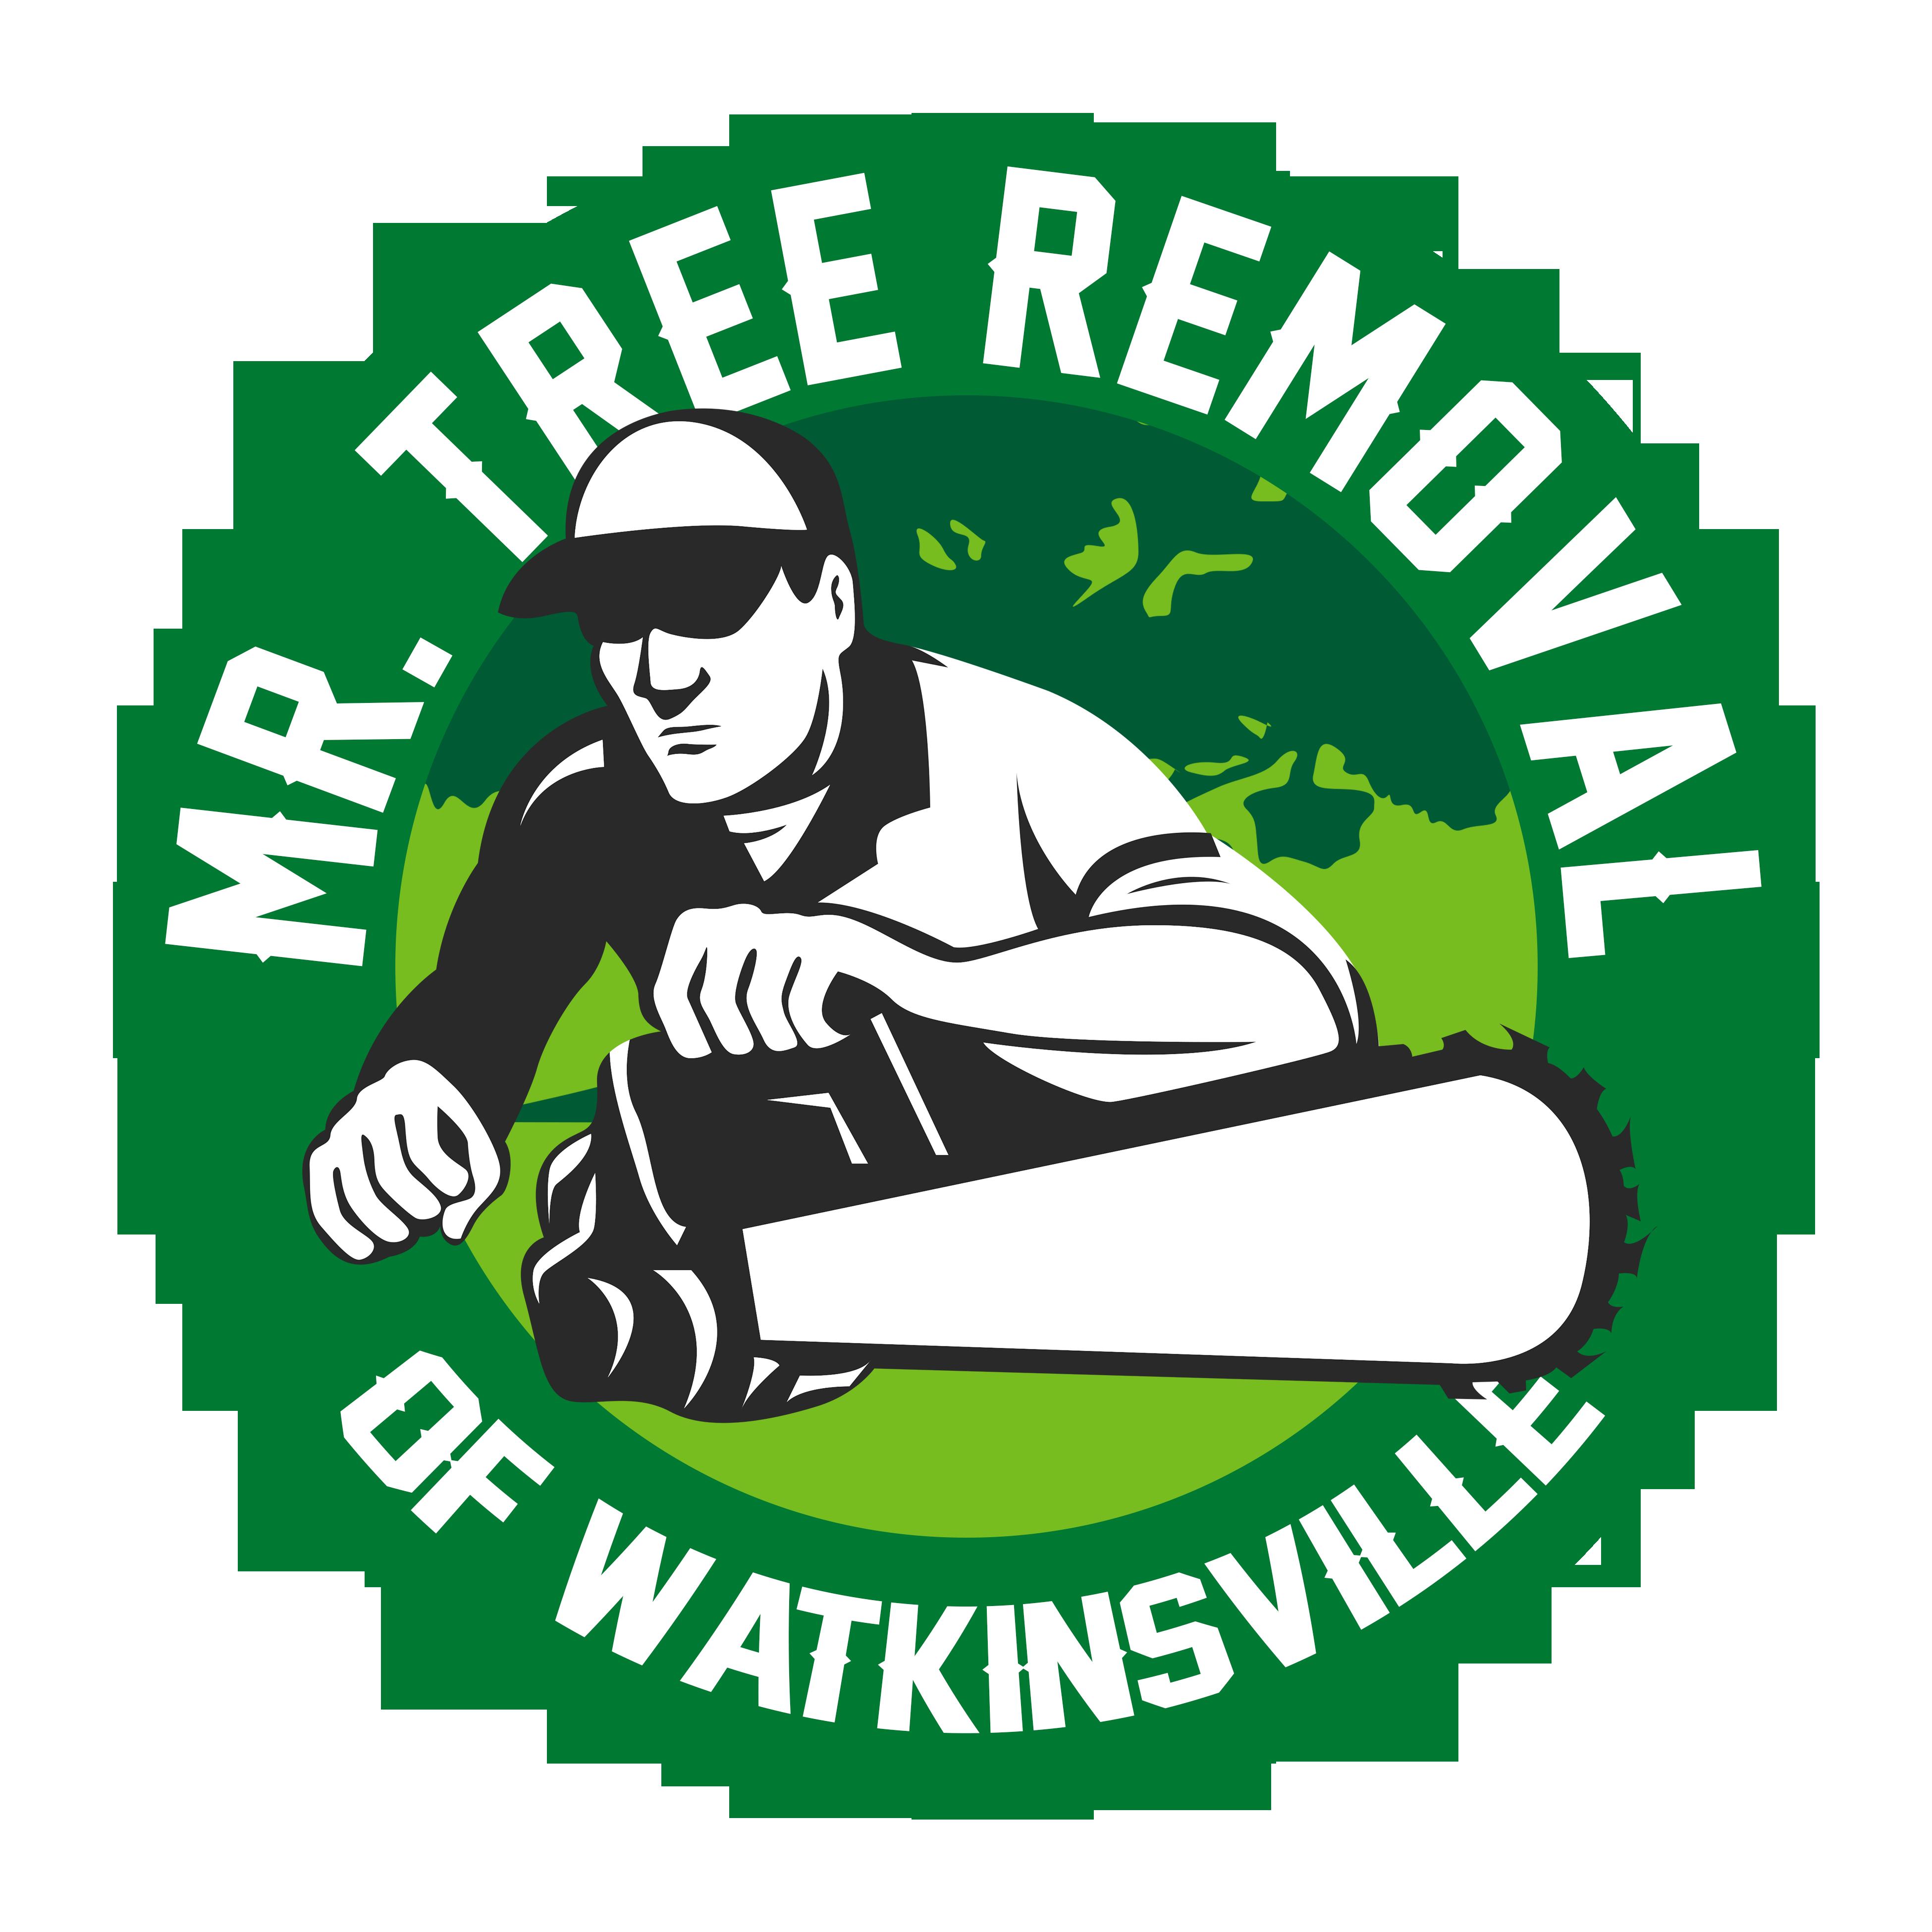 Mr Tree Removal of Watkinsville